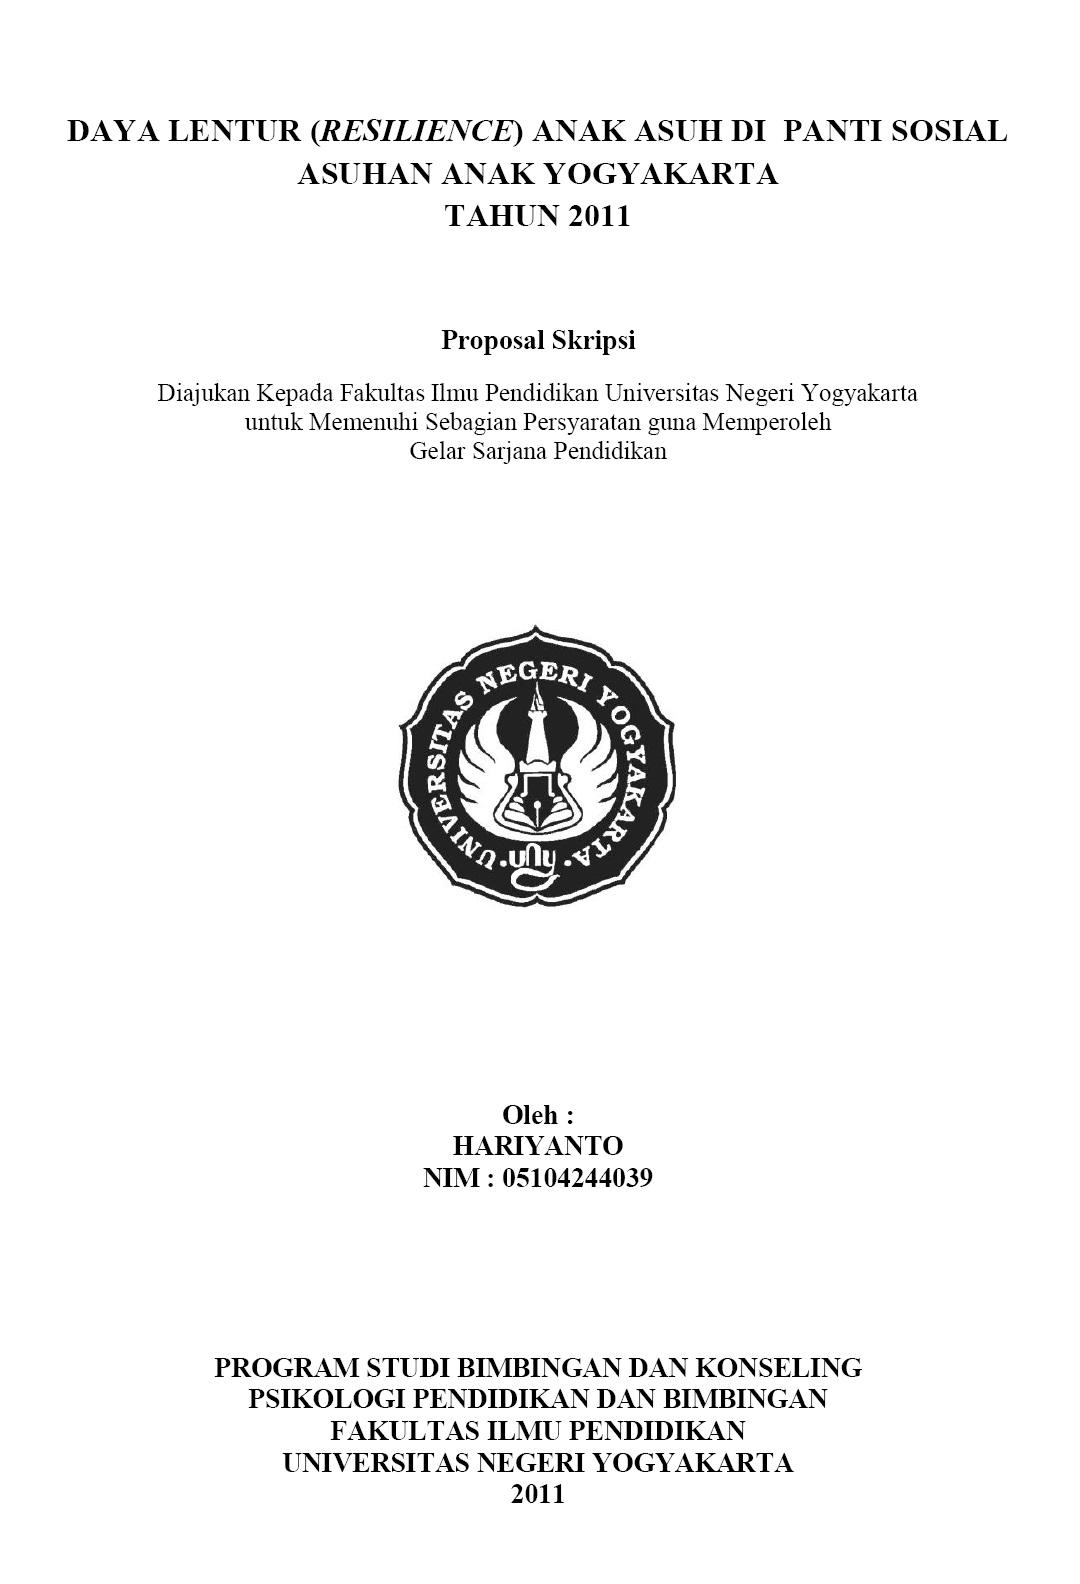 Contoh Proposal Bahasa Inggris Kualitatif Fasrfeed